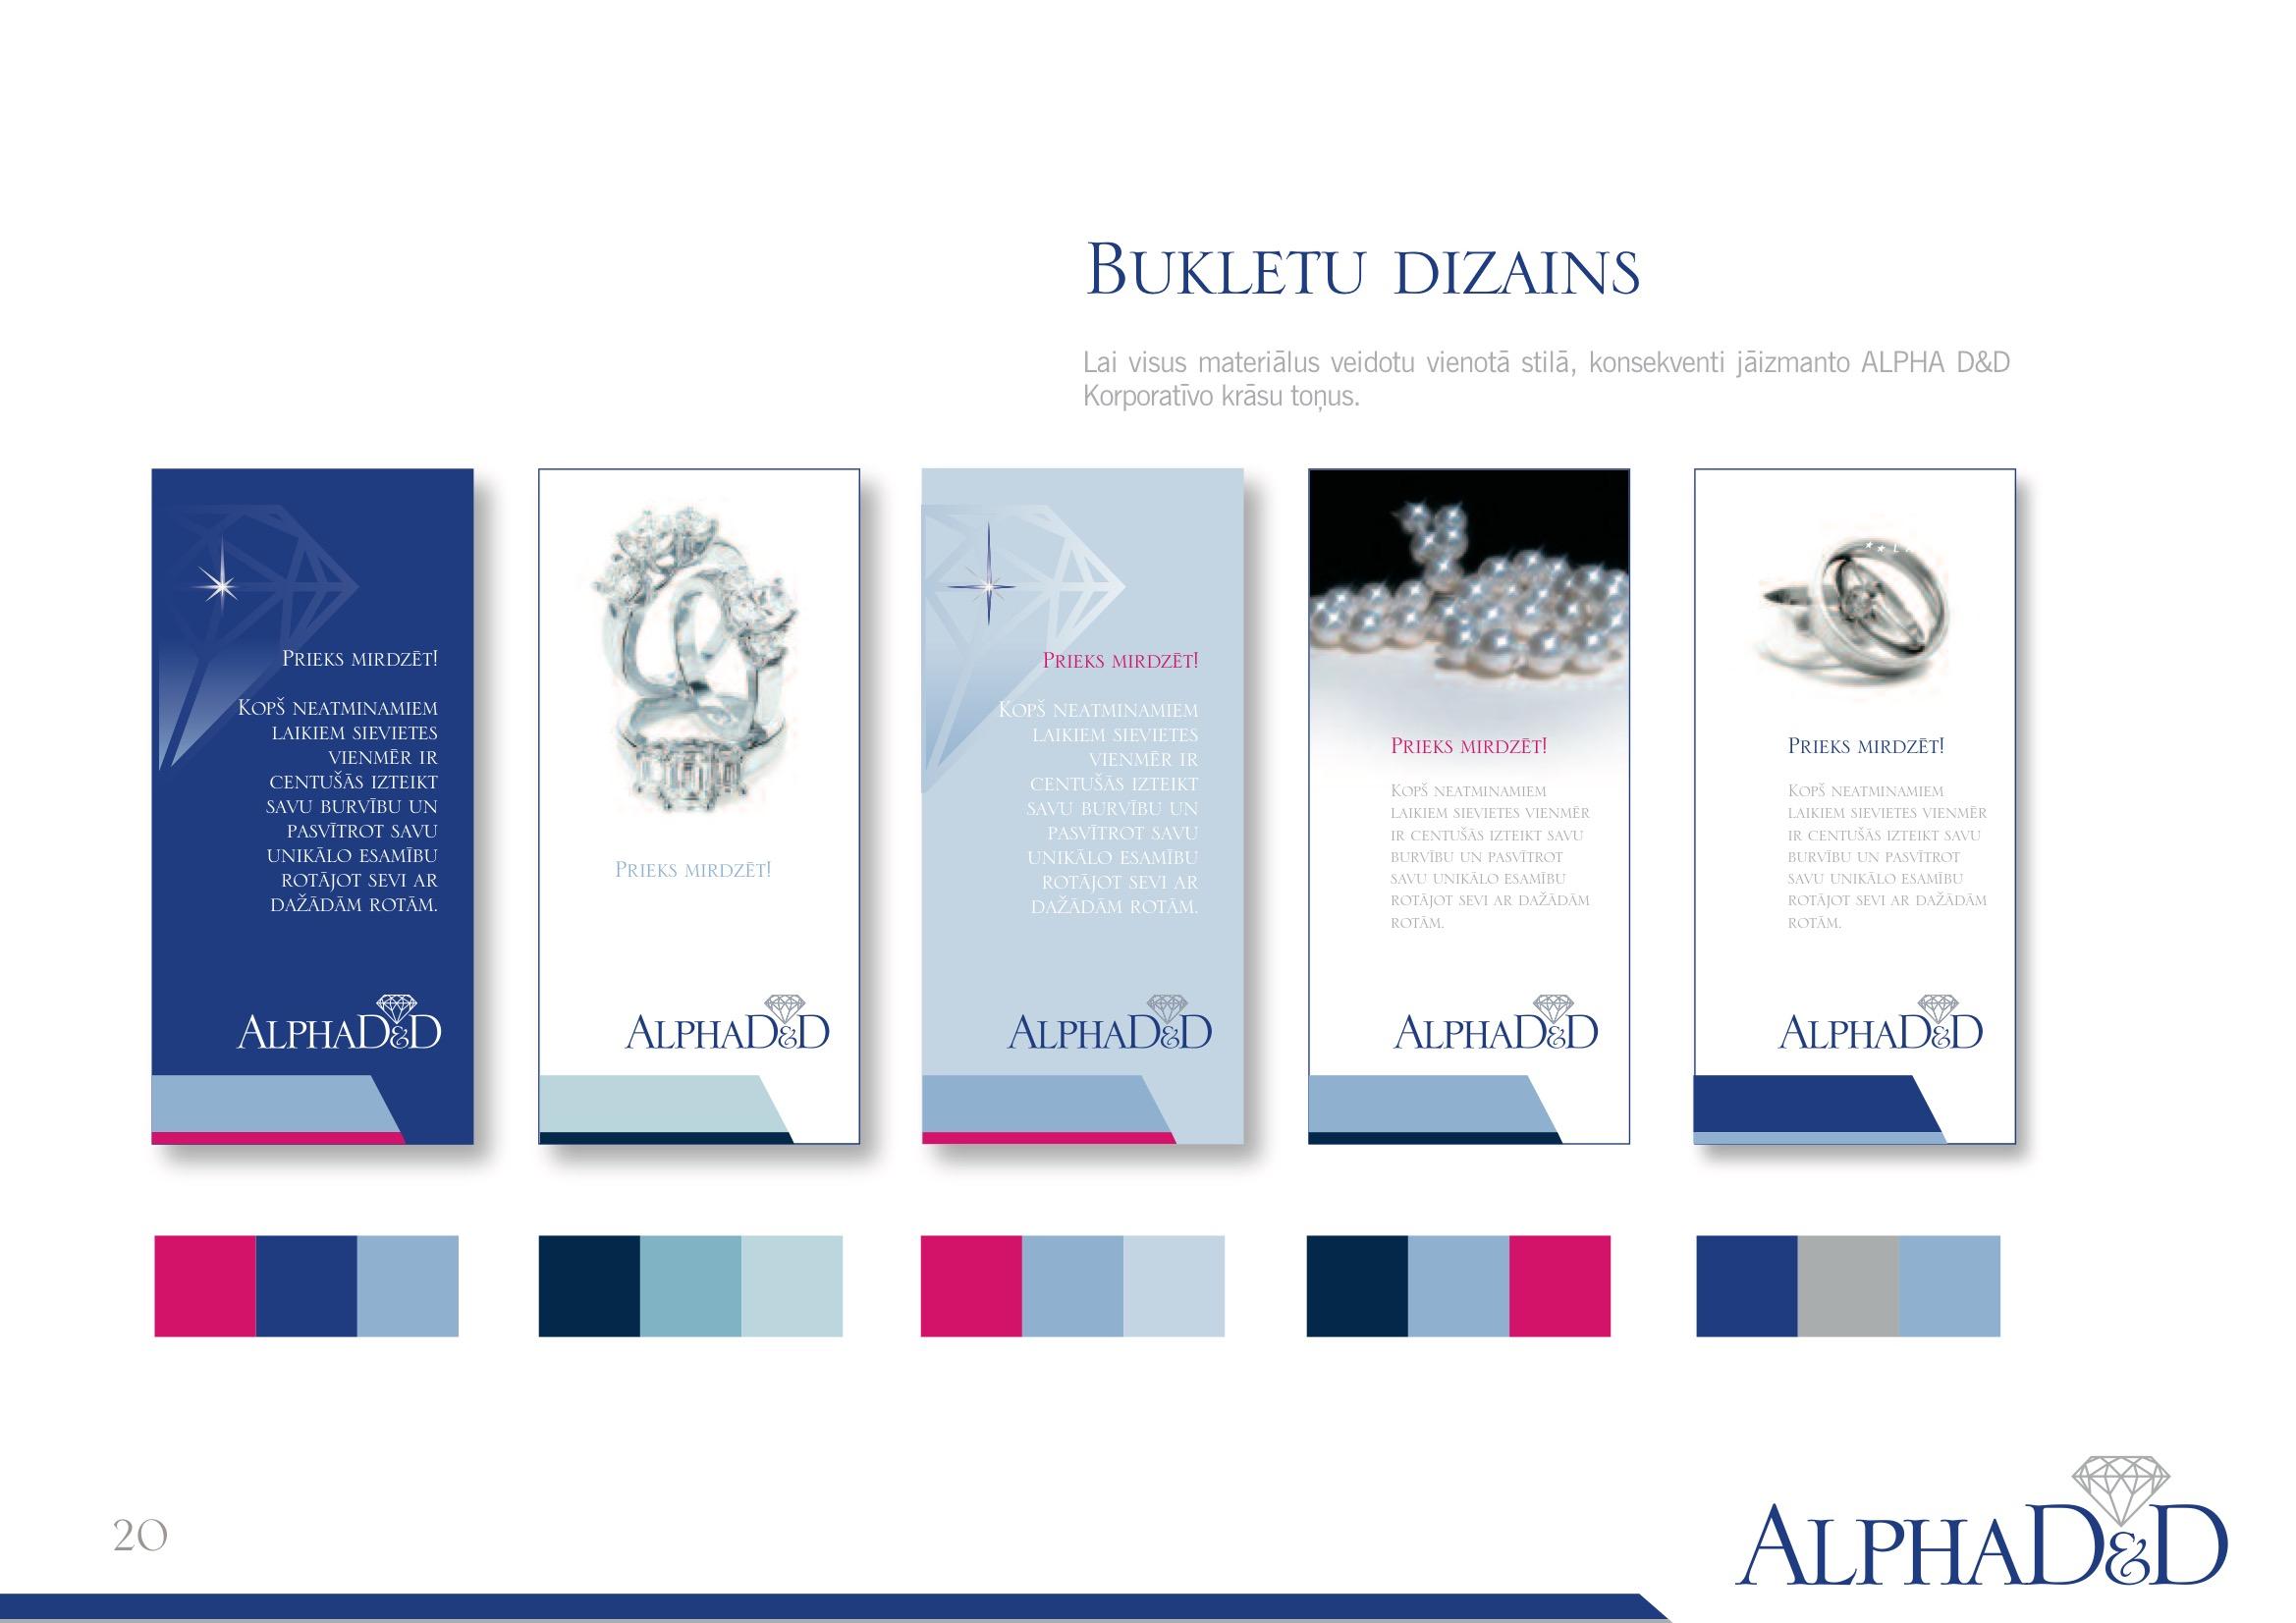 AlphaDD_Stils 20